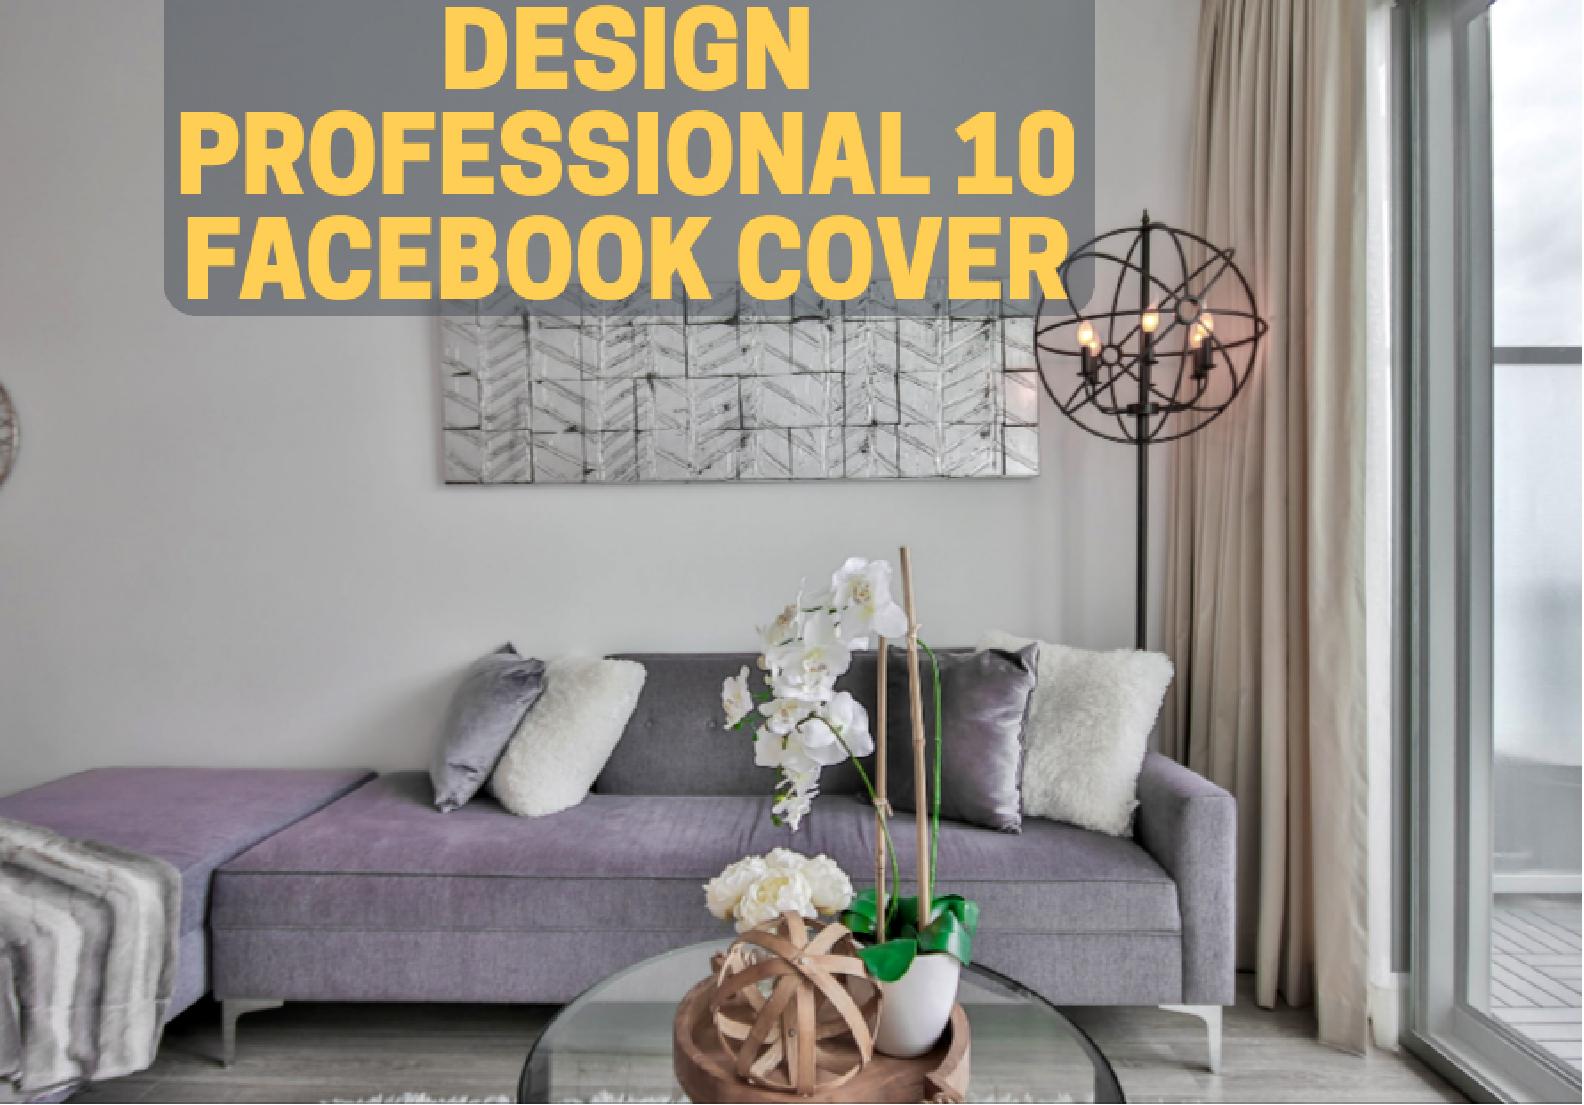 Best Quality 10 Facebook Cover Design